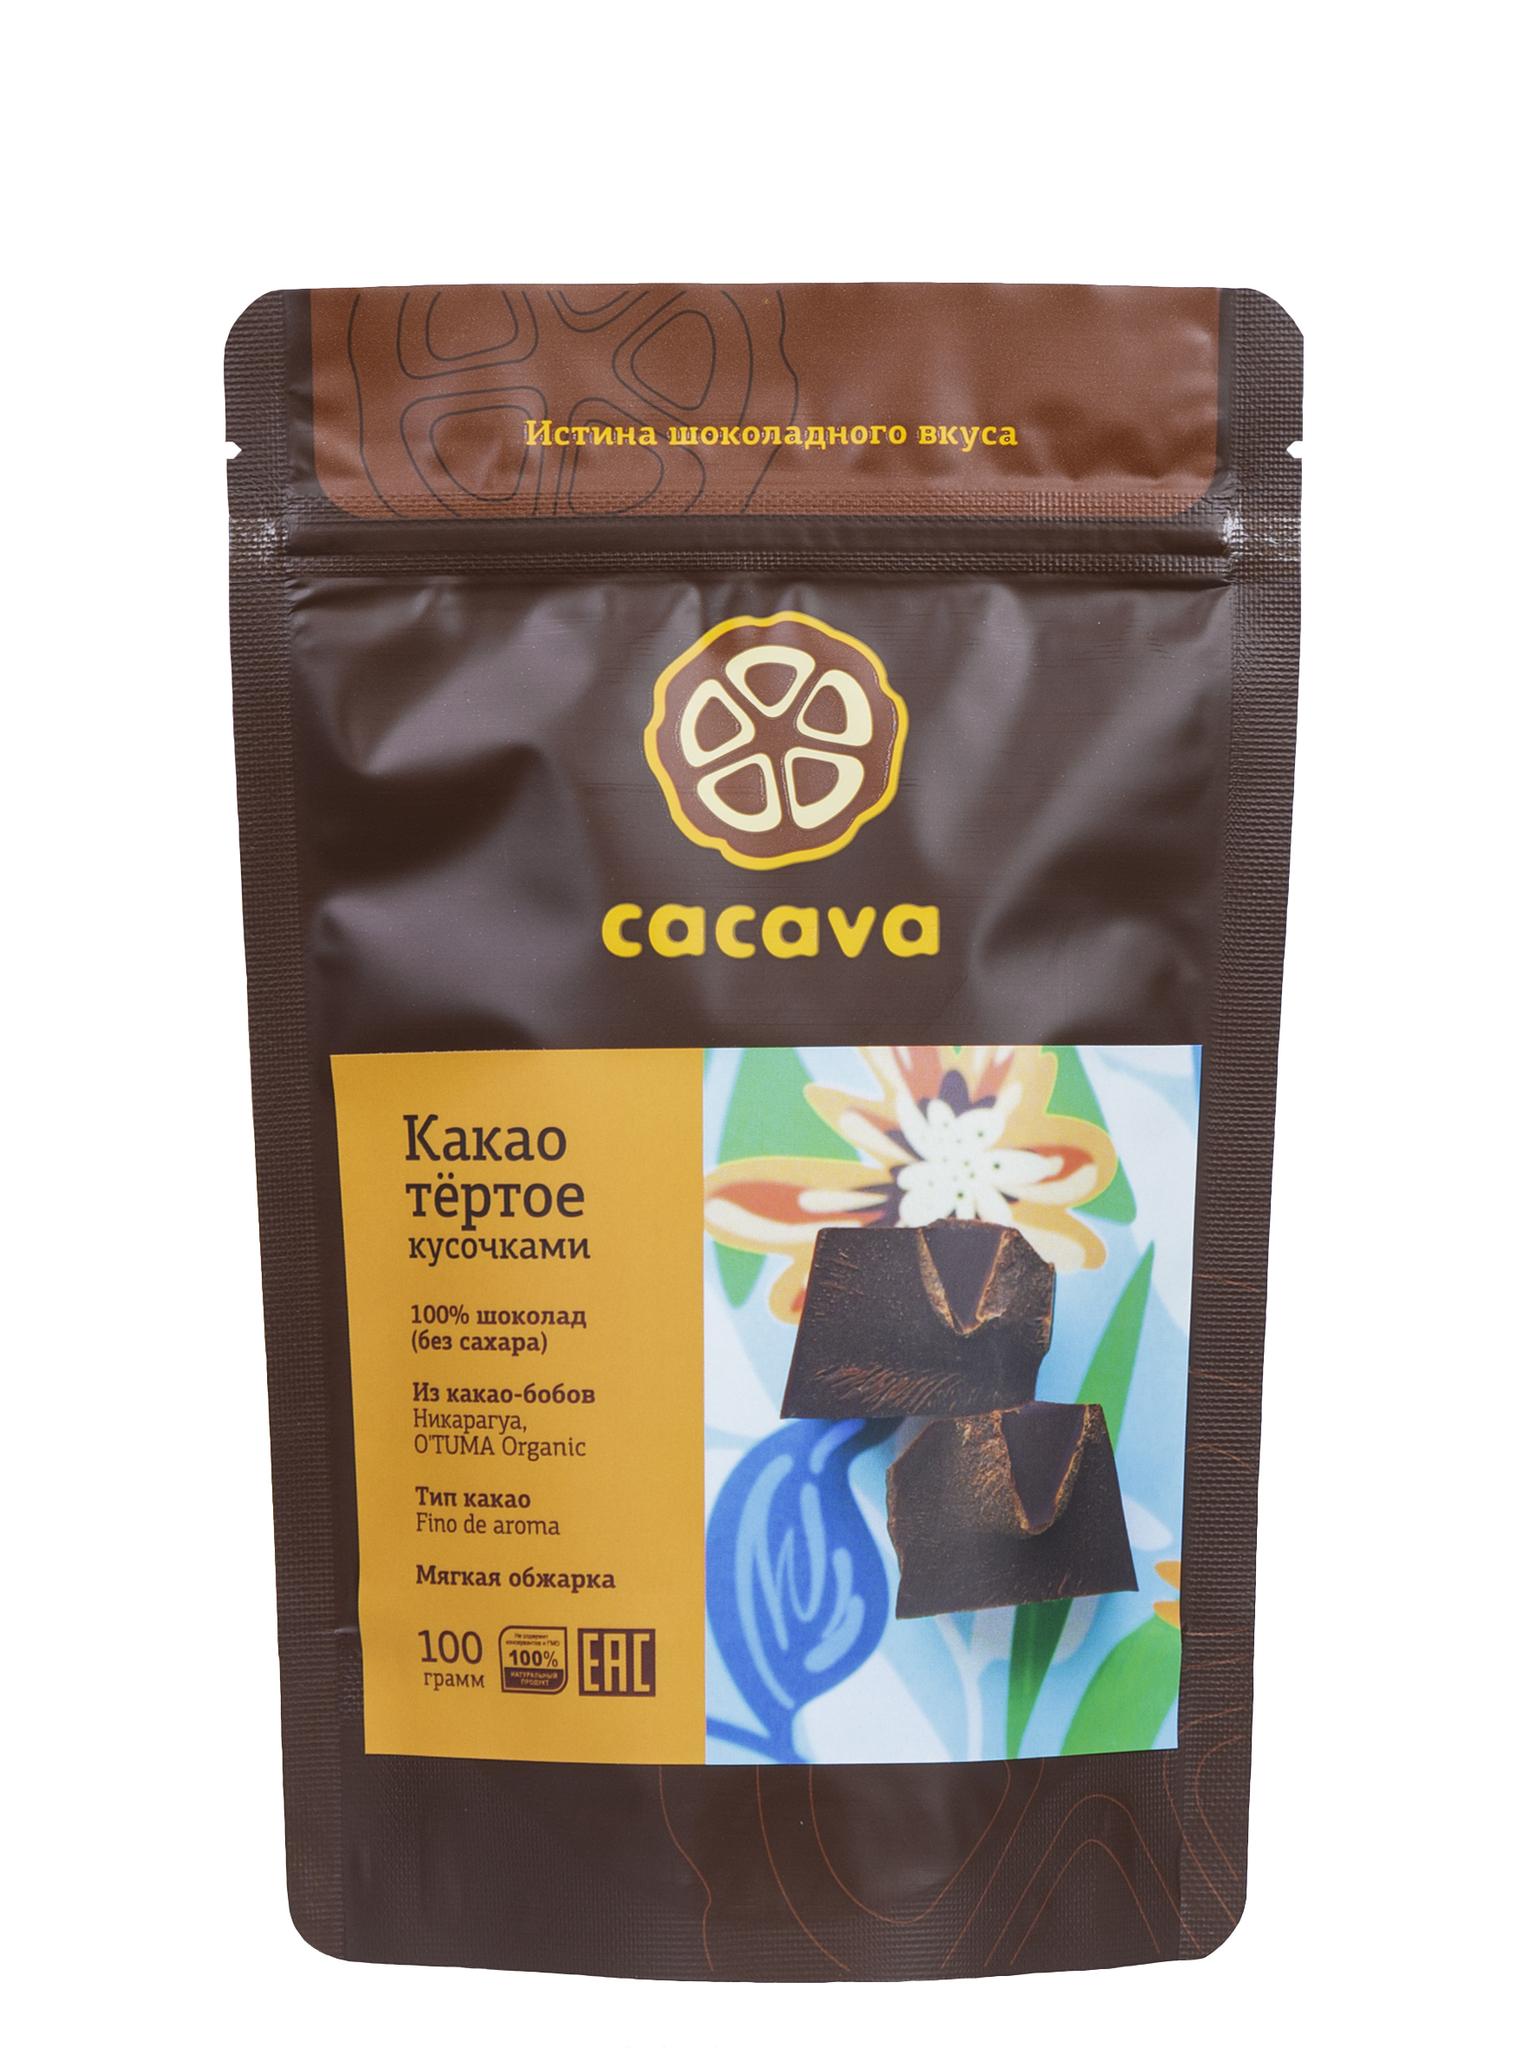 Какао тёртое кусочками (Никарагуа O'Tuma), упаковка 100 грамм